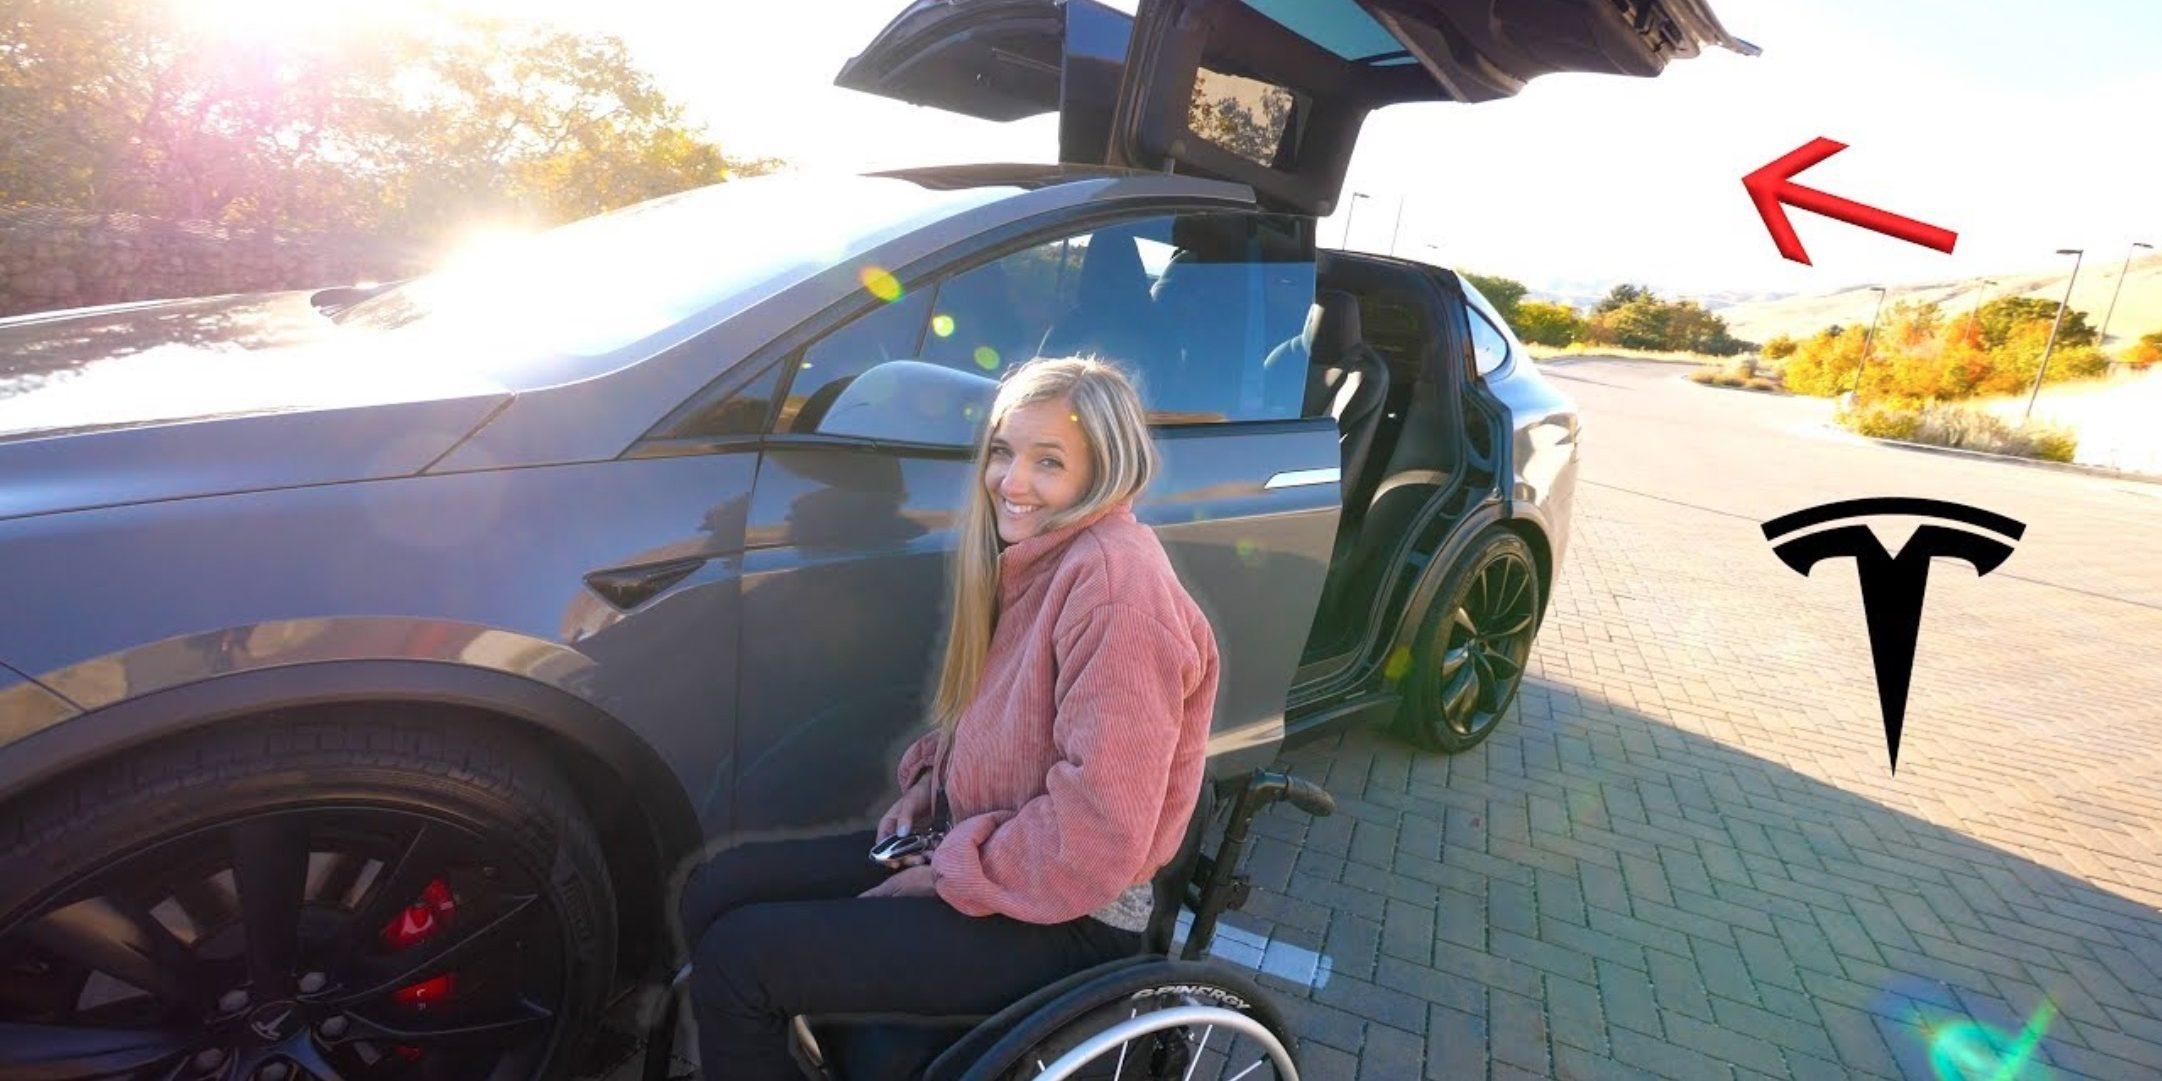 Tesla Smart Summon proves useful for wheelchair users - Electrek